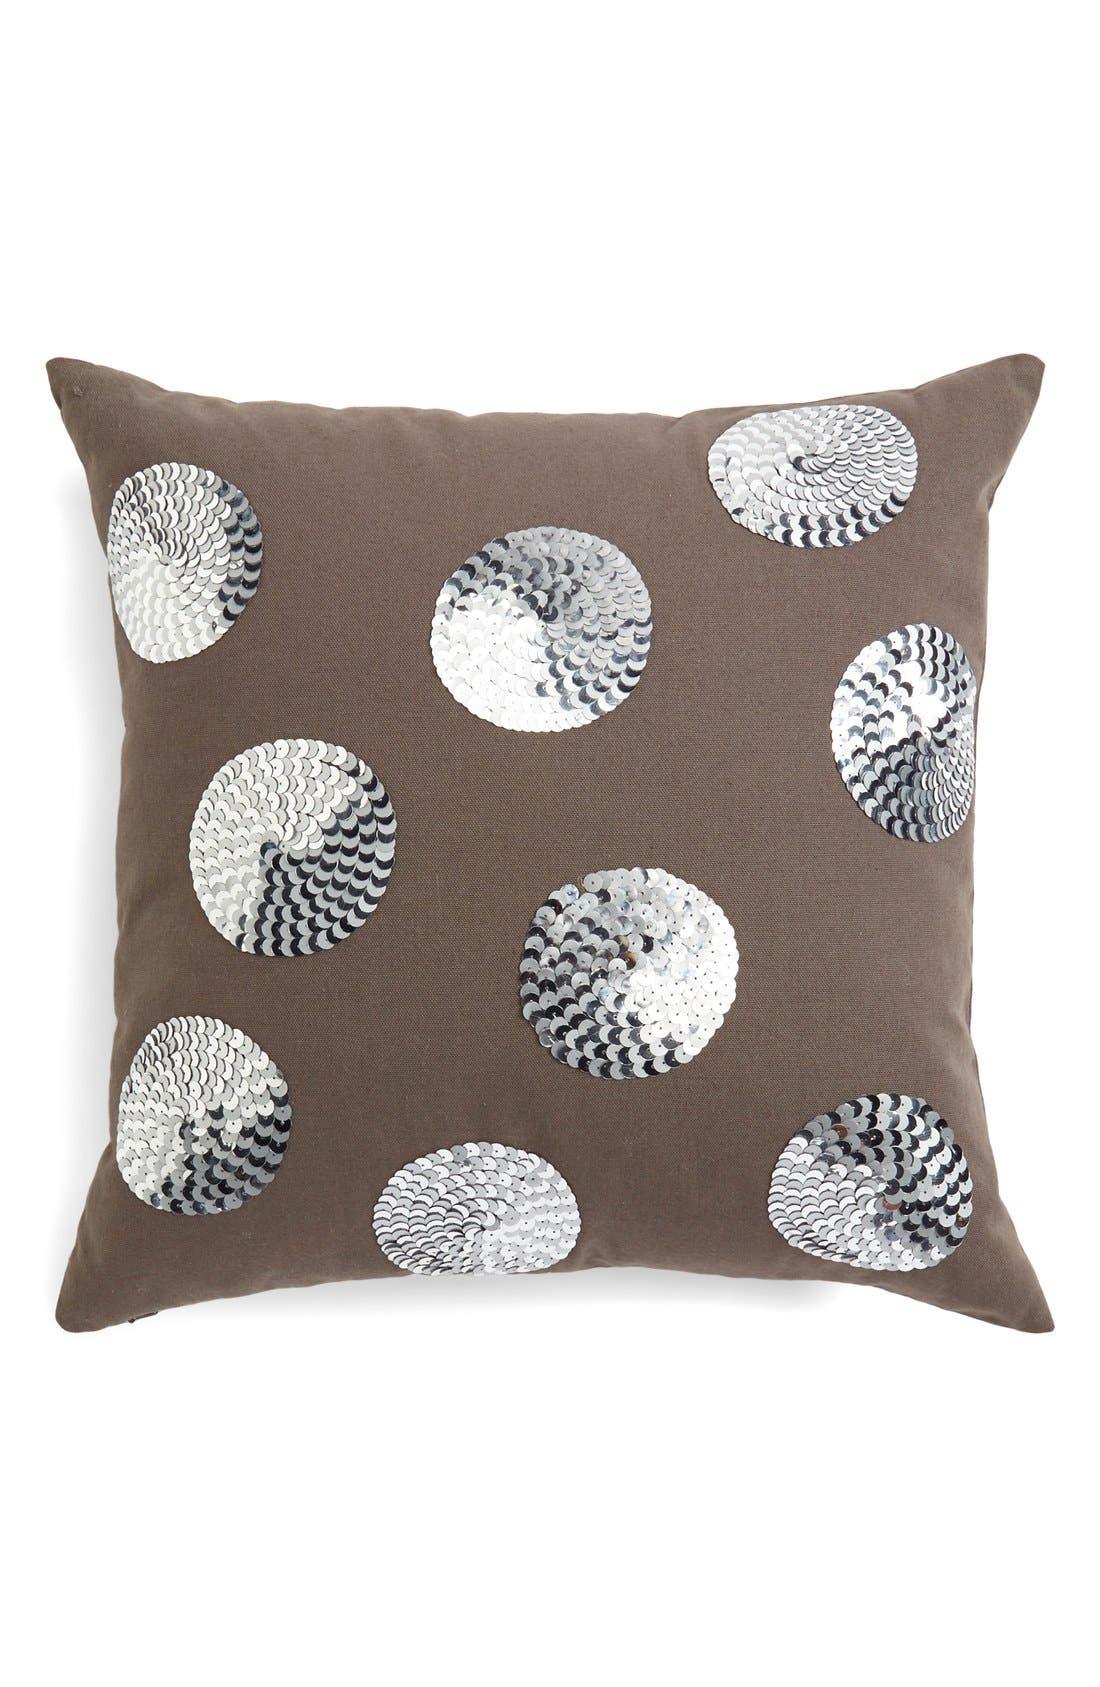 Main Image - Nordstrom at Home 'Dottie Paillettes'Accent Pillow